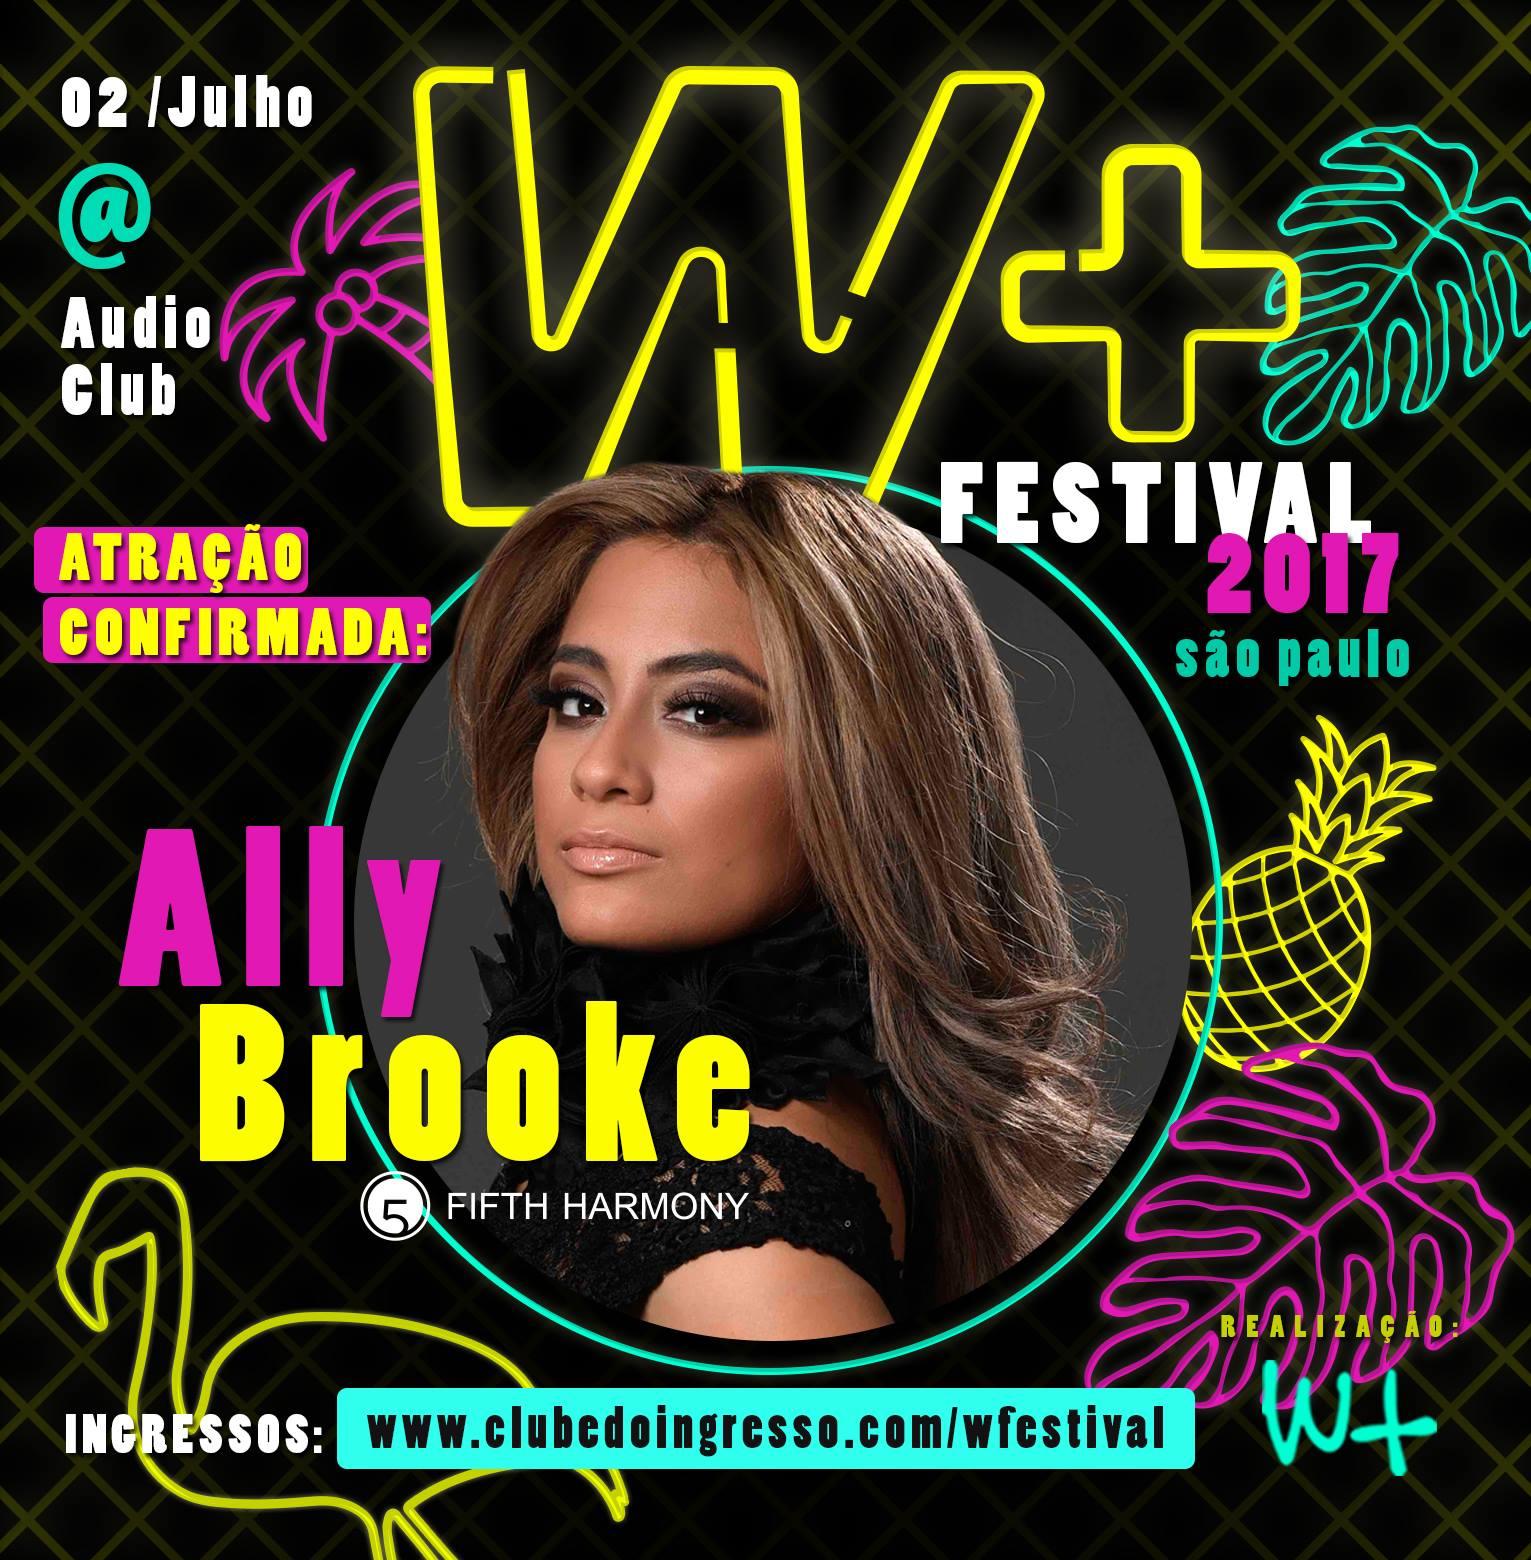 Ally Brooke